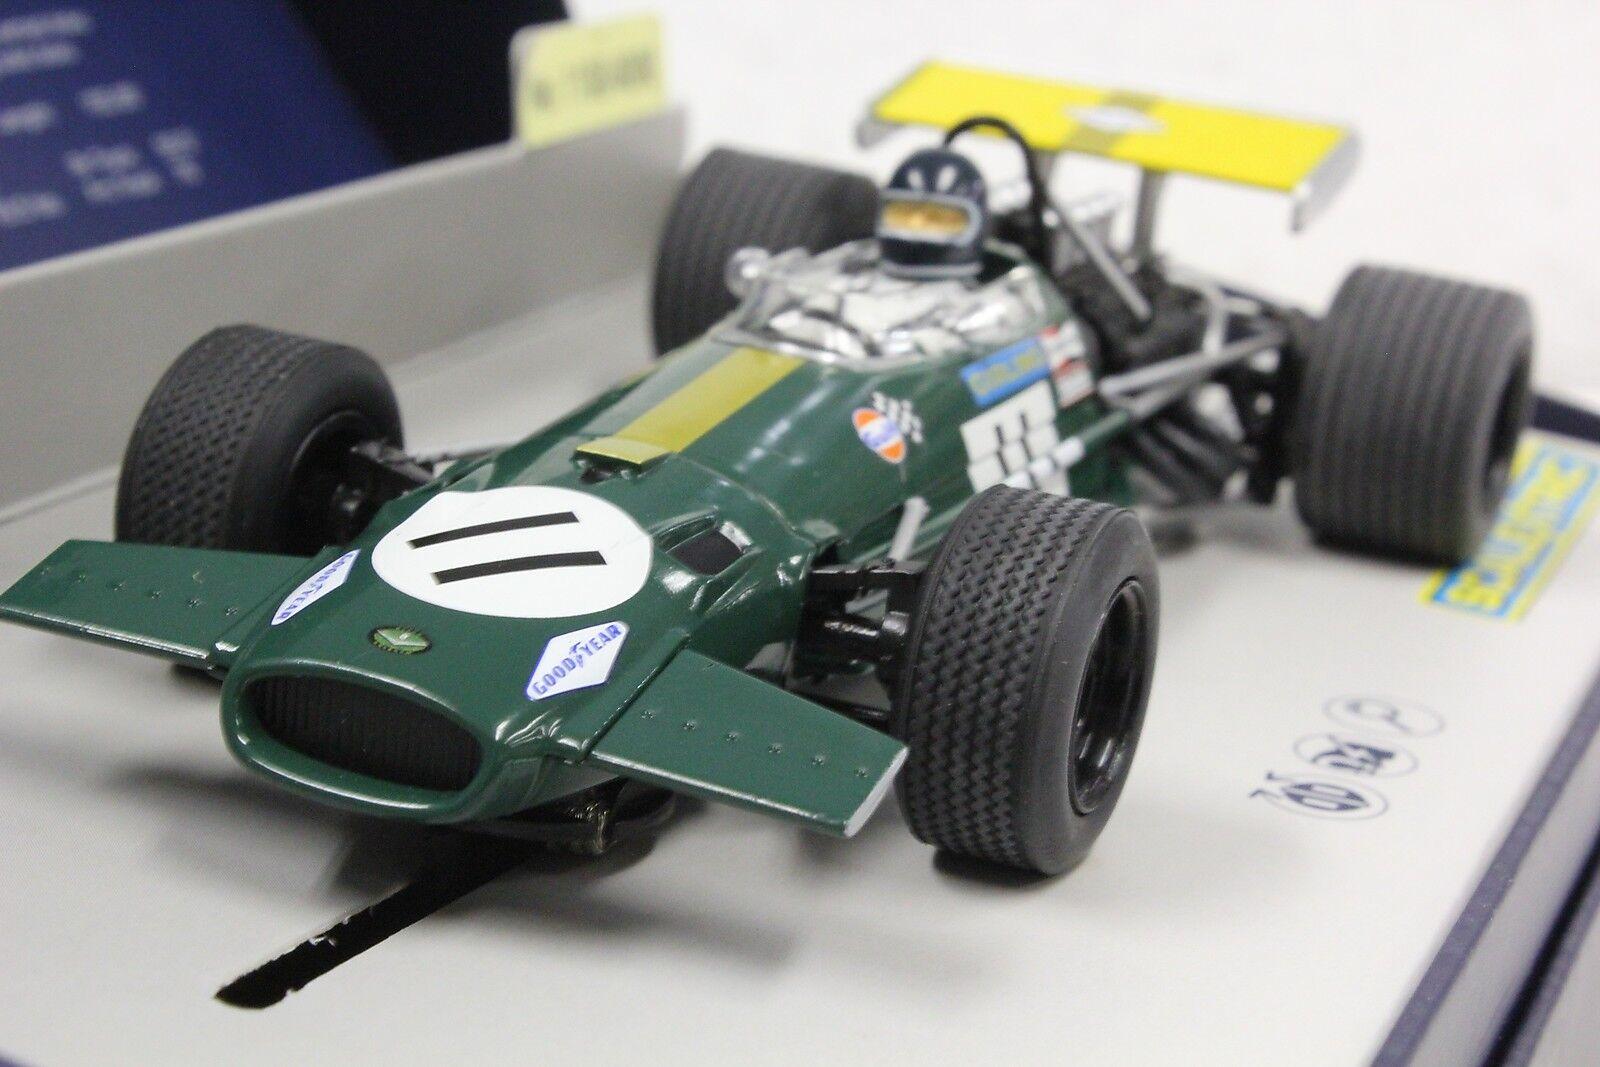 Scalextric C3588A Brabham BT-26 3 Jacky Ickx ,Limitado Edition 1 32 Coche